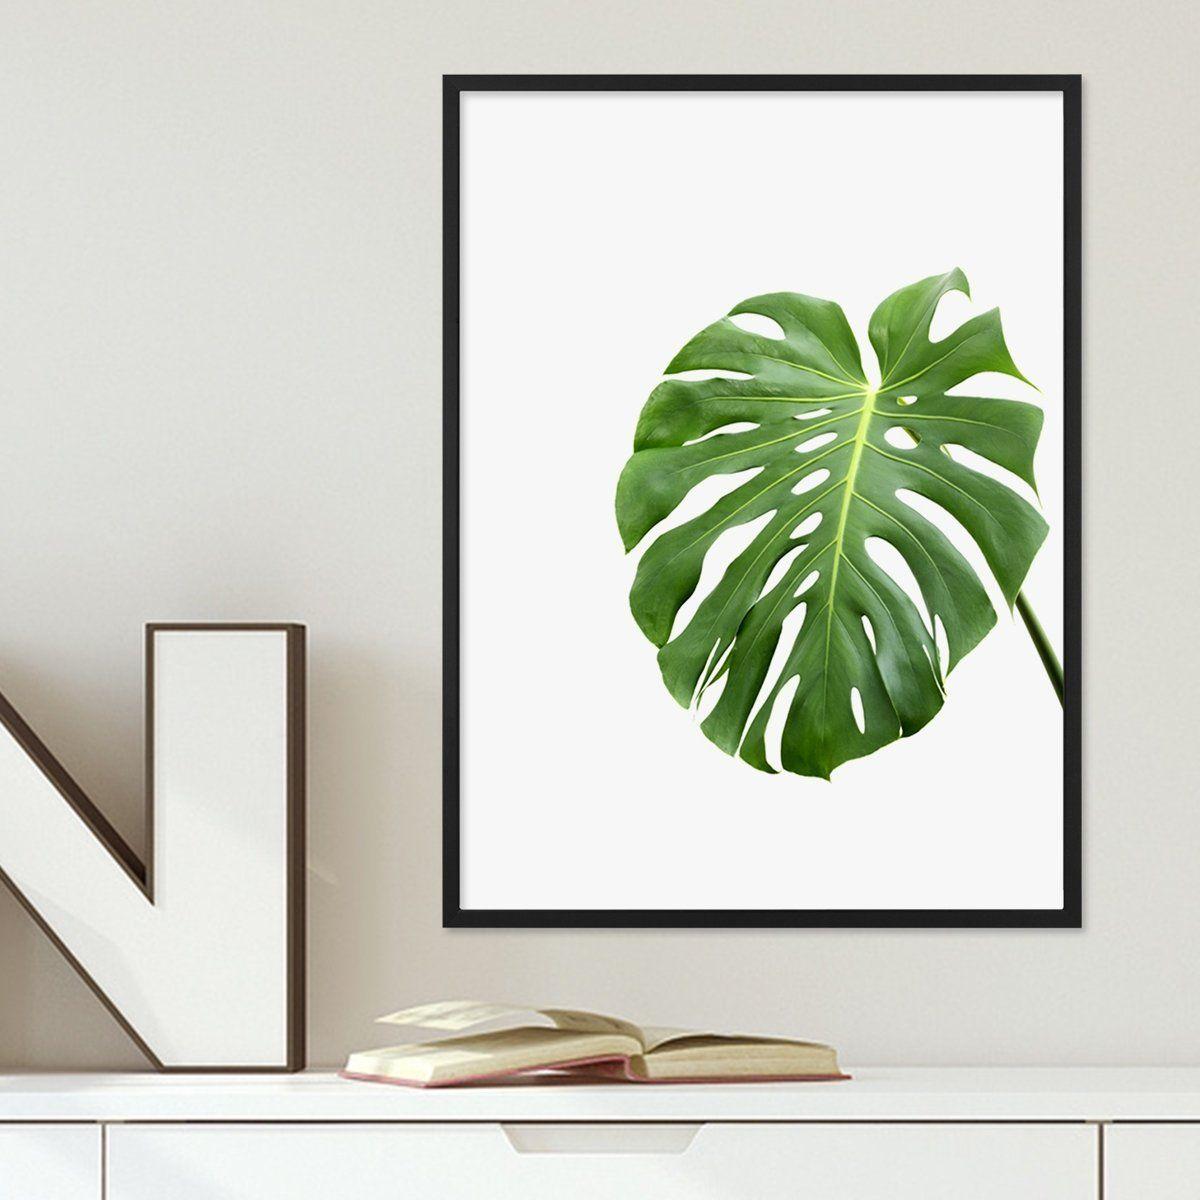 Poster \'Monstera Blatt\' 30x40 cm Motiv Natur Foto Pflanze ...